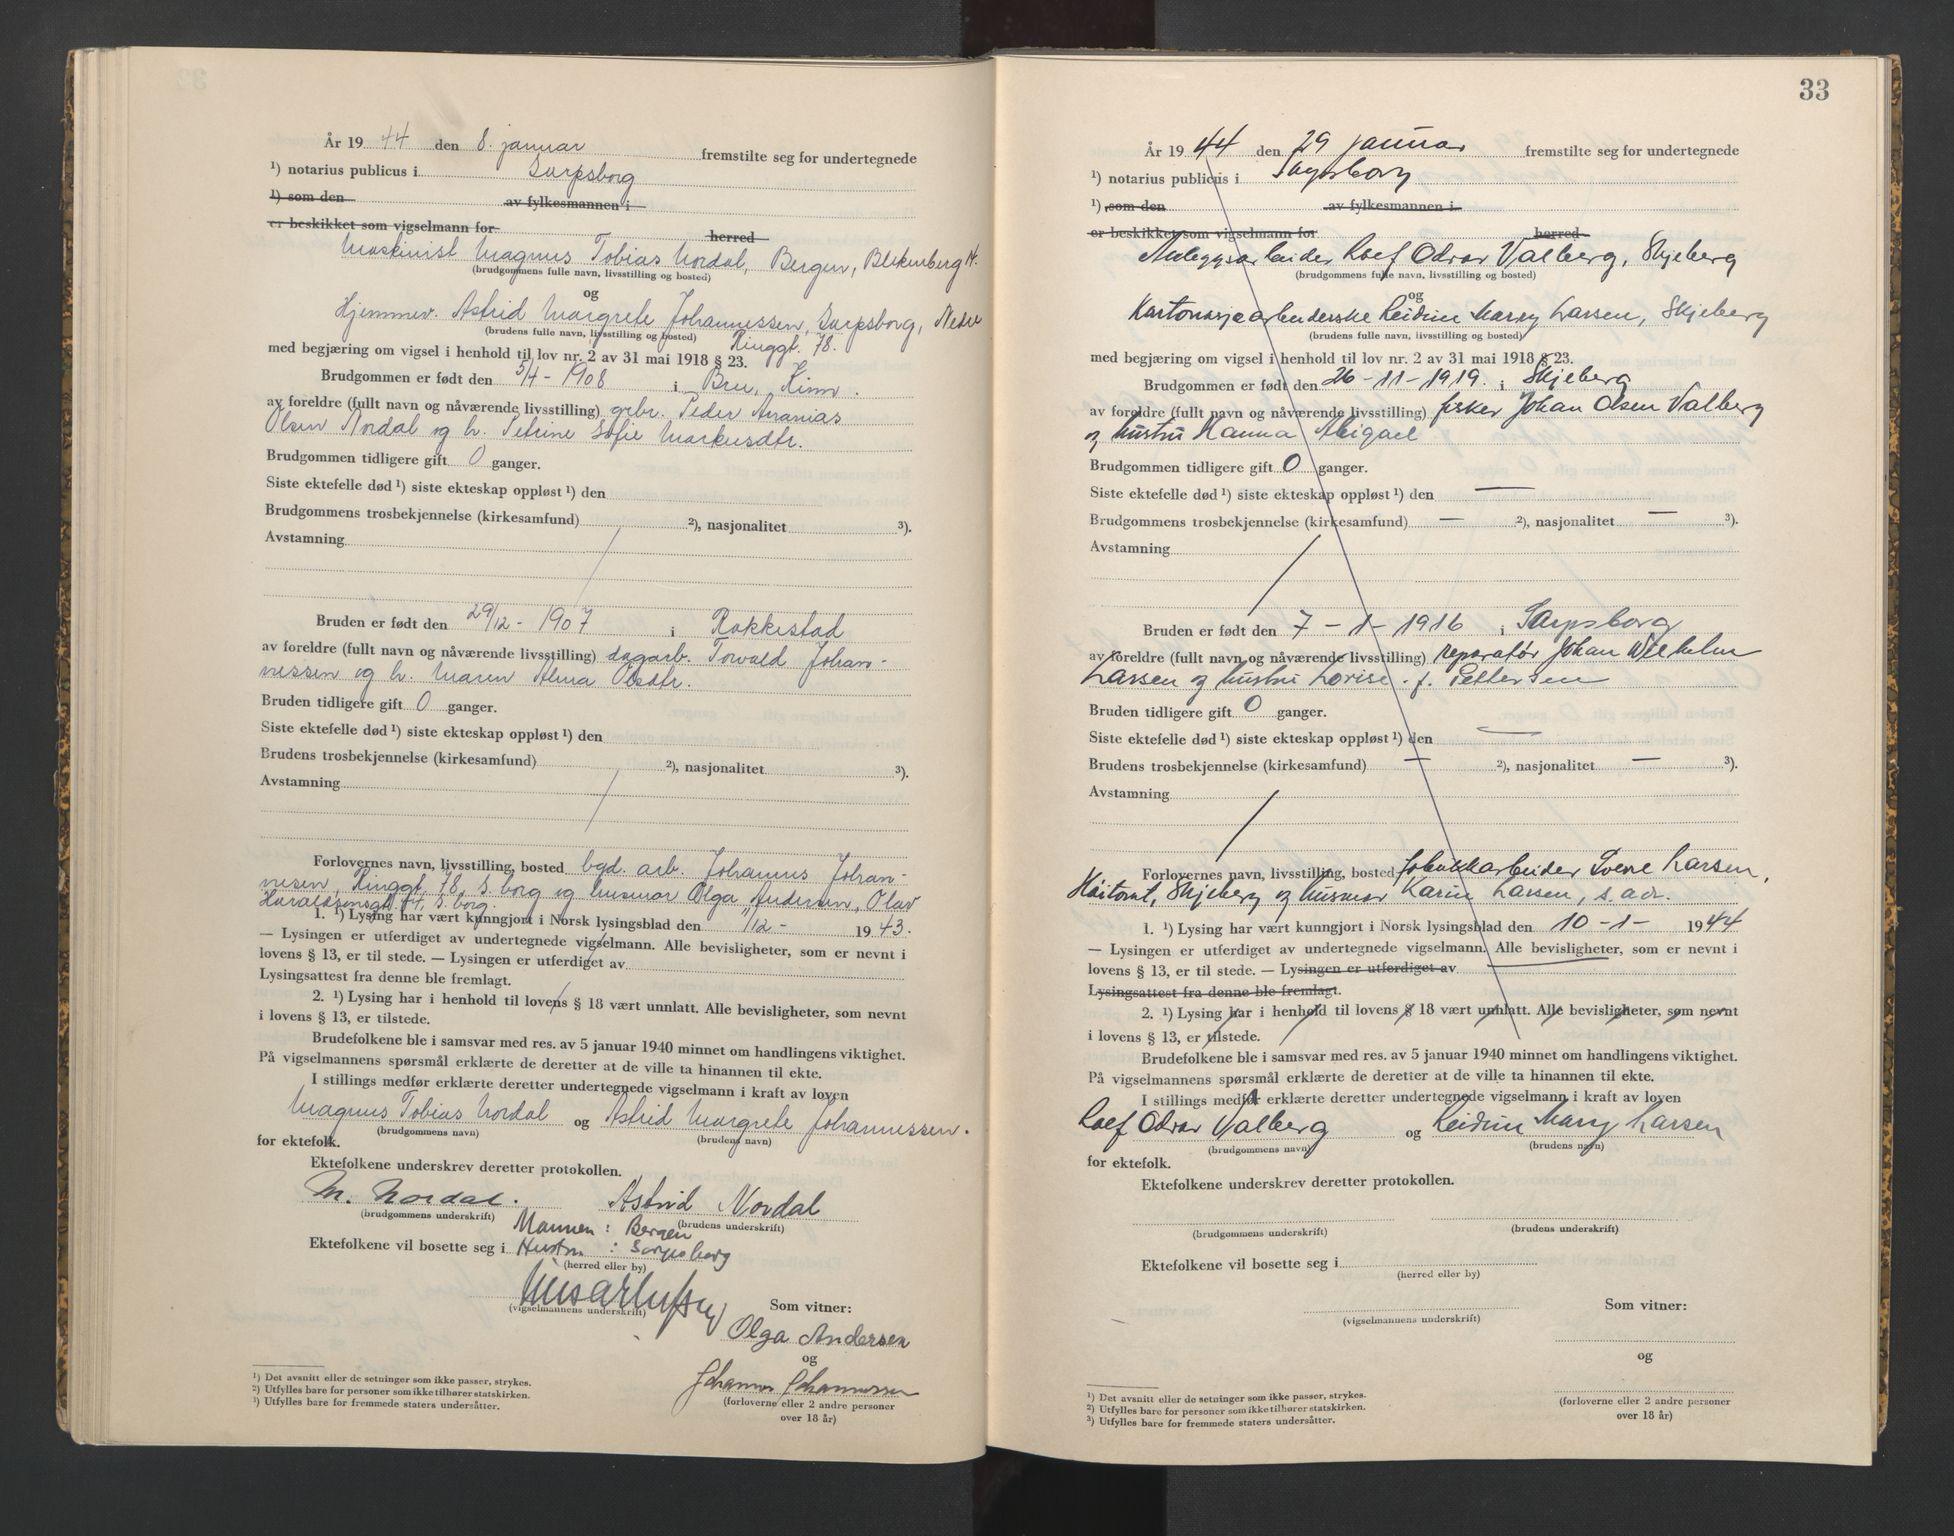 SAO, Sarpsborg byfogd, L/Lb/Lba/L0003: Vigselbok, 1943-1945, s. 33